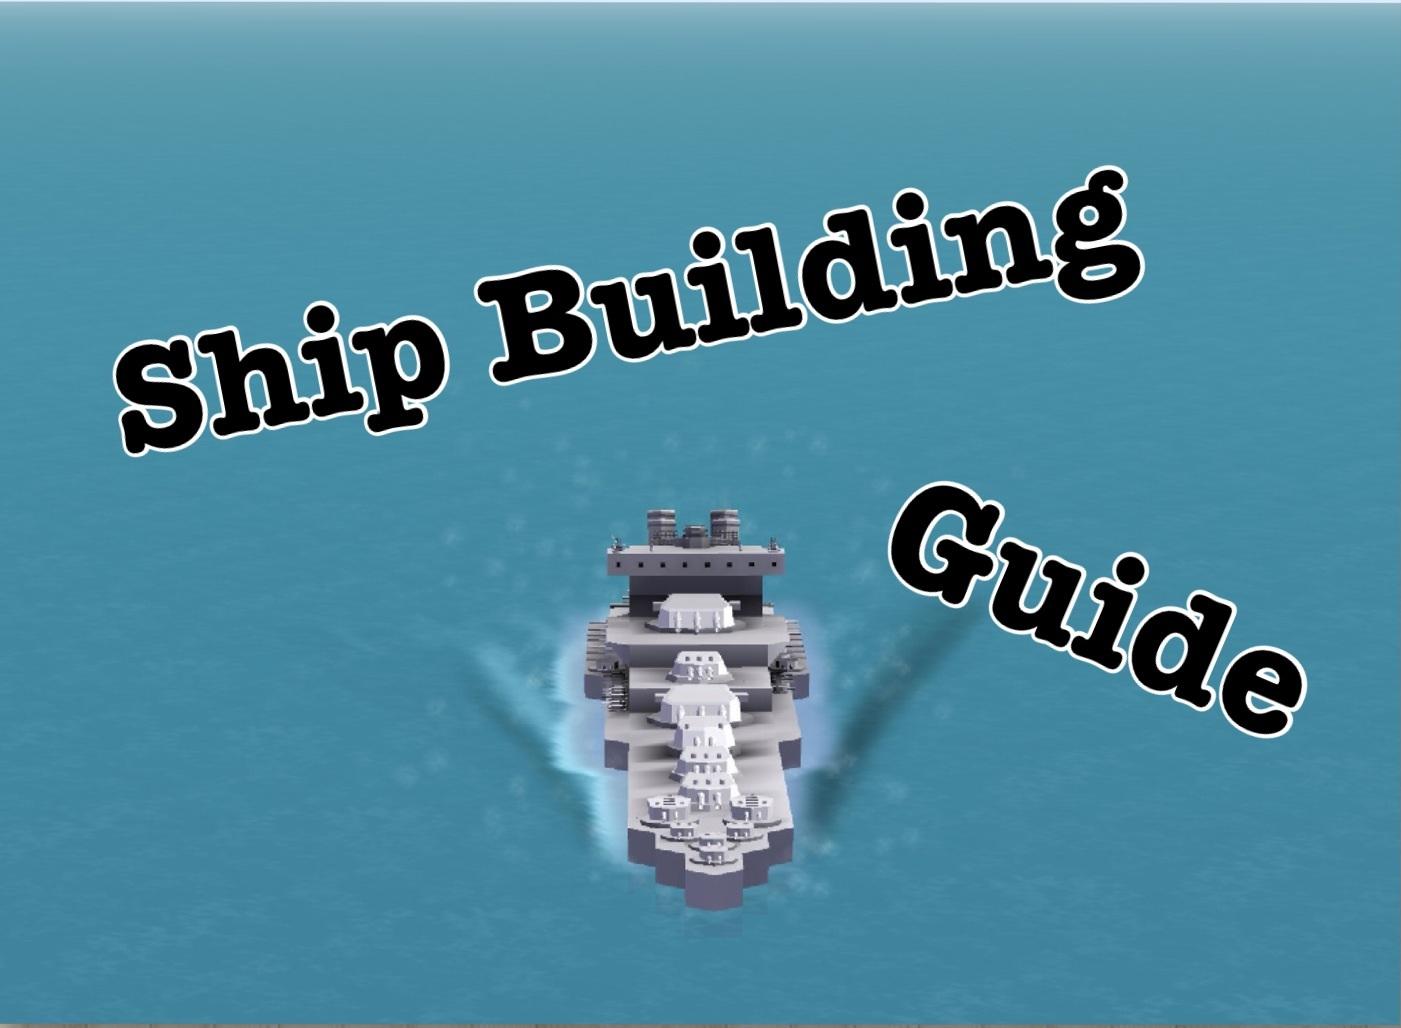 ShipBuilding Battleship Craft Wiki FANDOM Powered By Wikia - Cruise ship building games